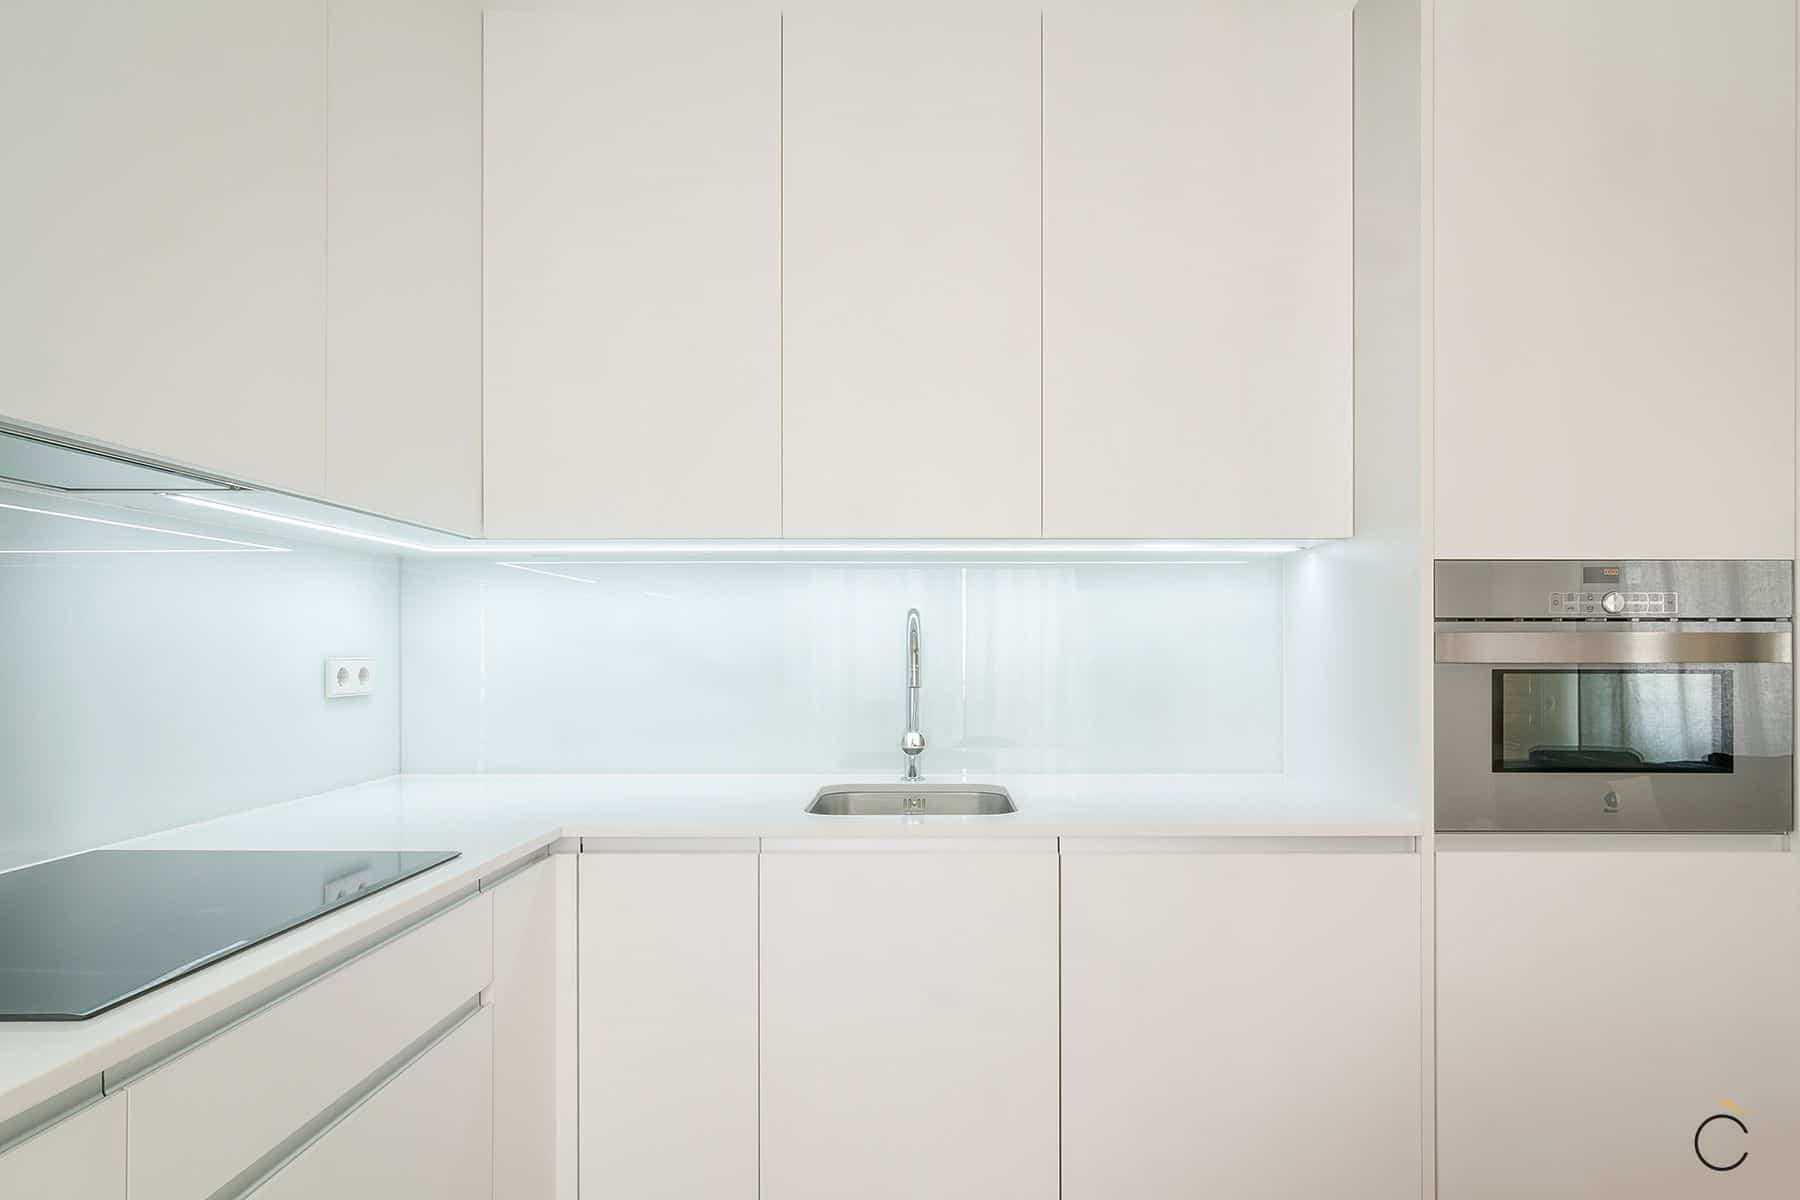 iluminar la encimera de la cocina tiras led